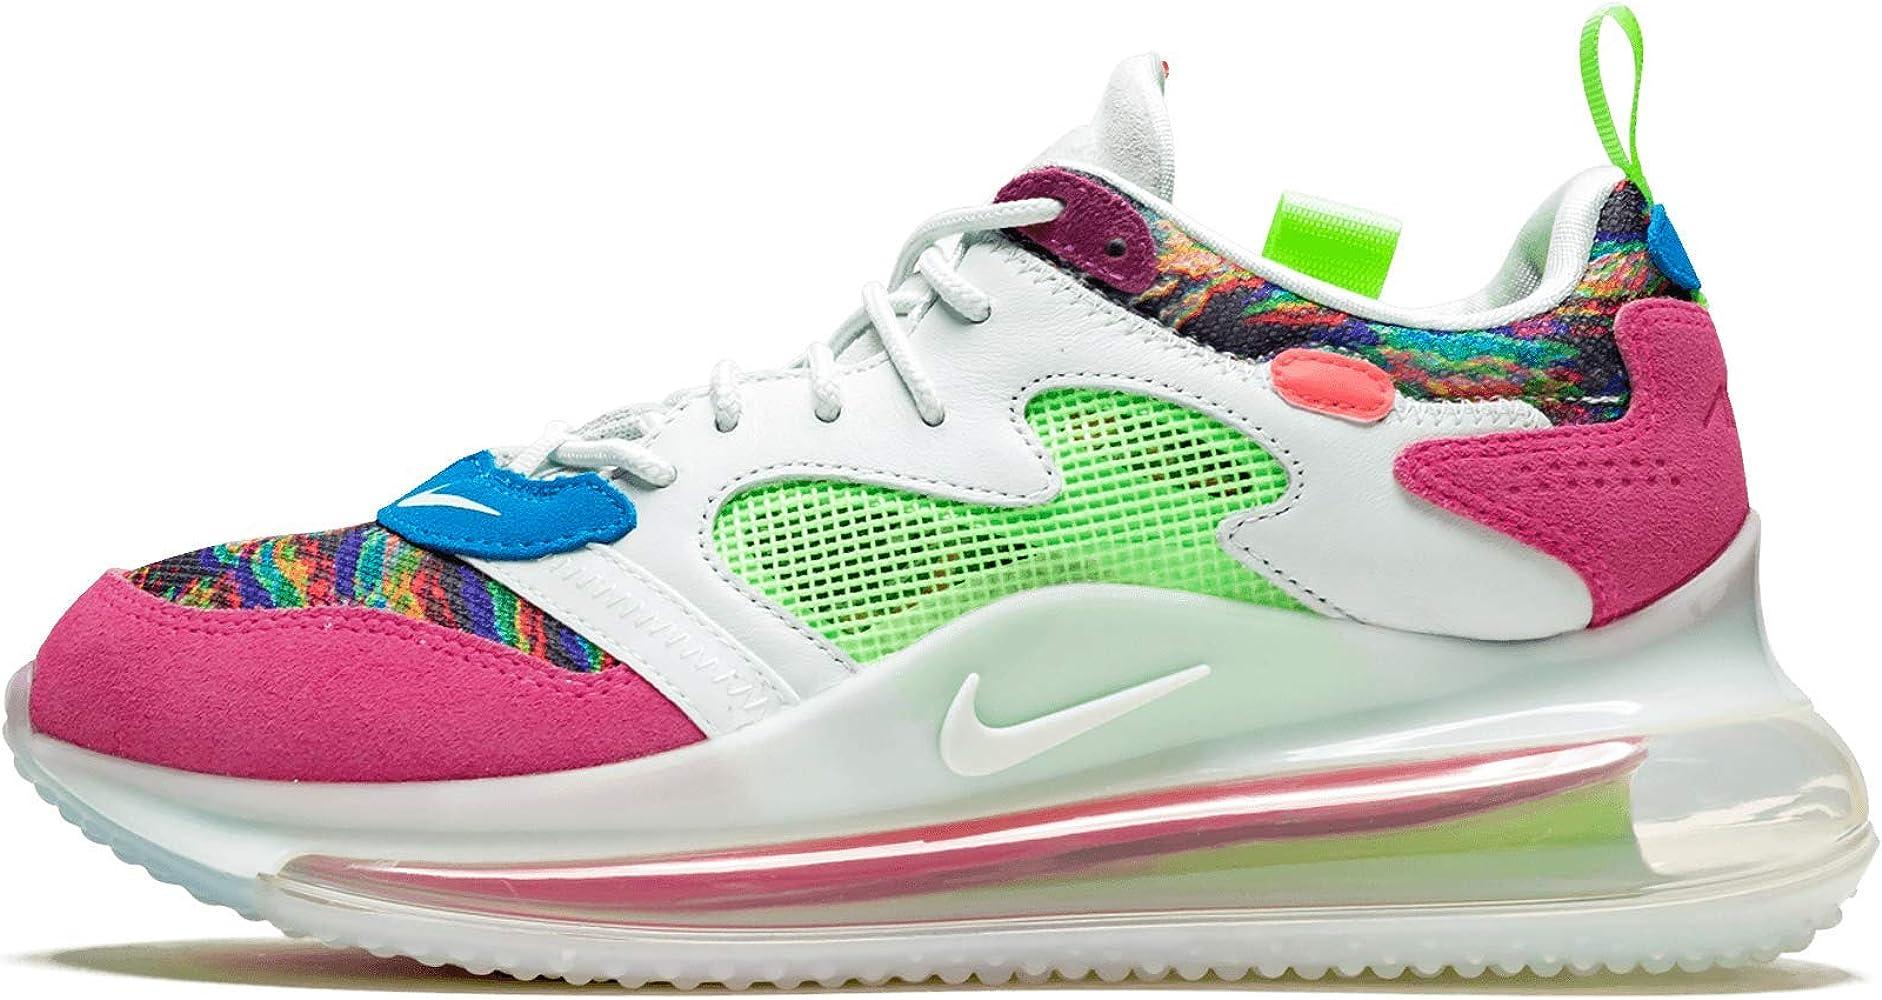 Nike Air Max 720 Obj (Multi Color